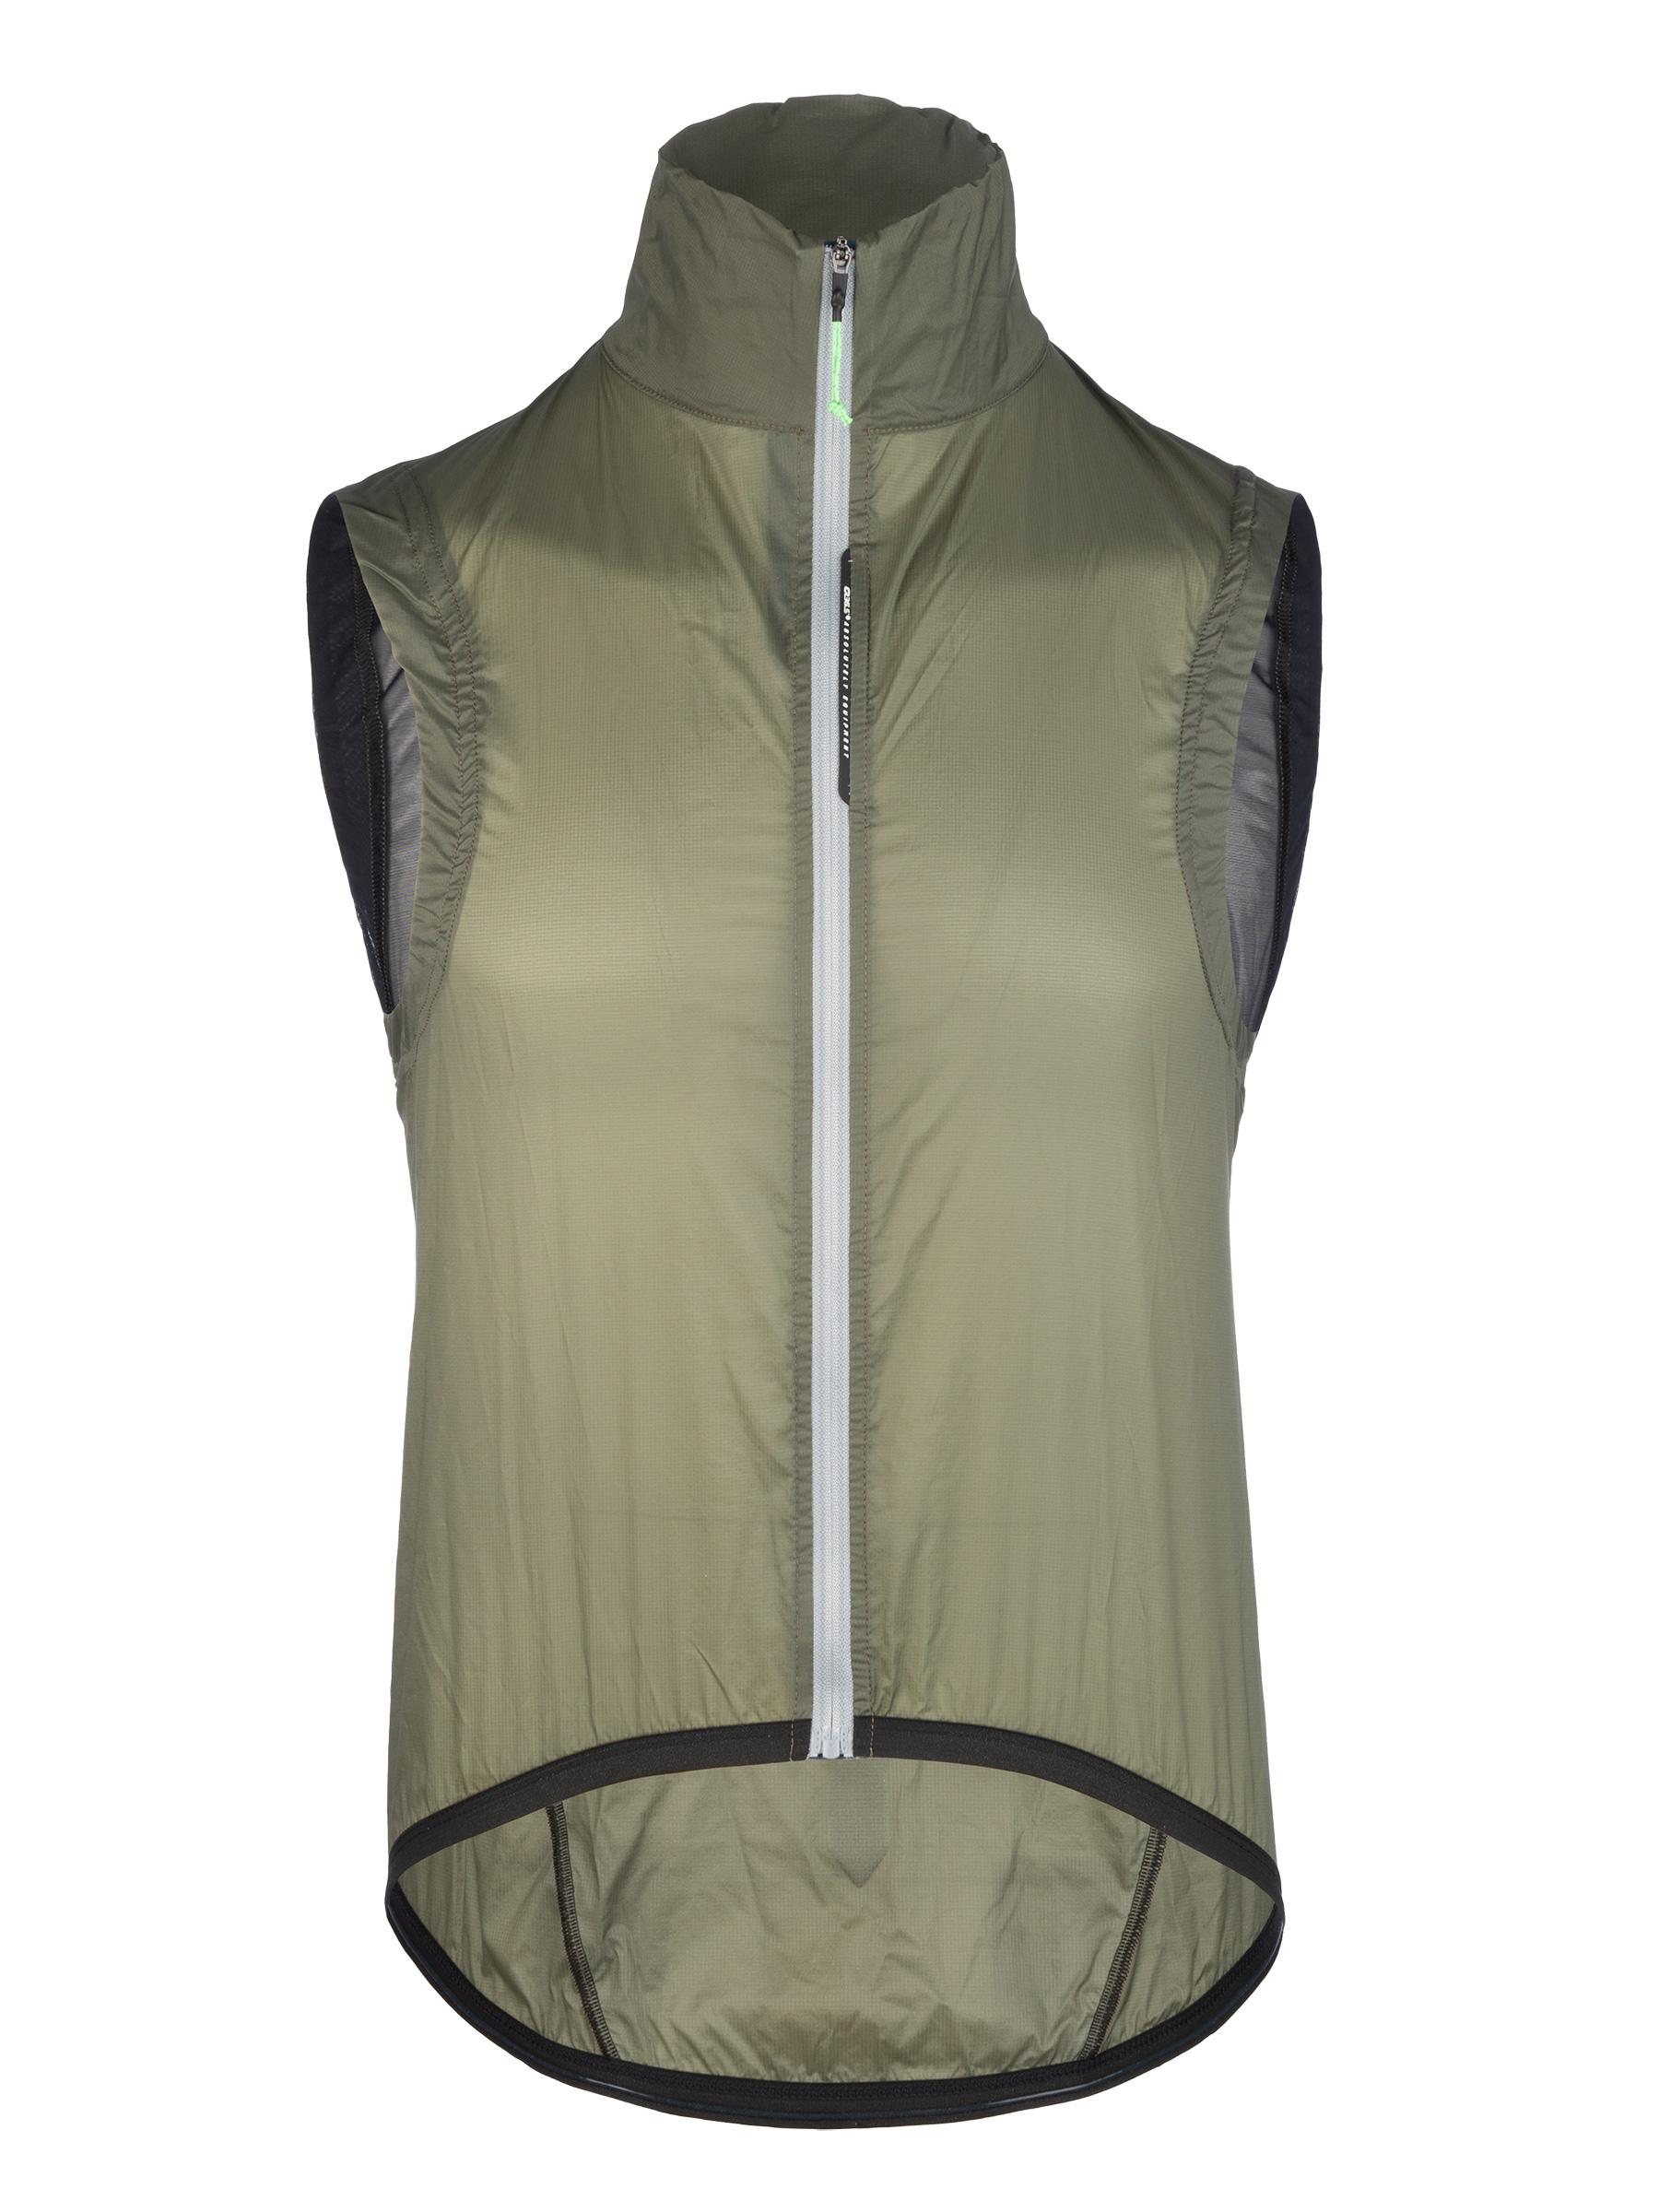 cycling-vest-068.14-Air Vest-olive-front